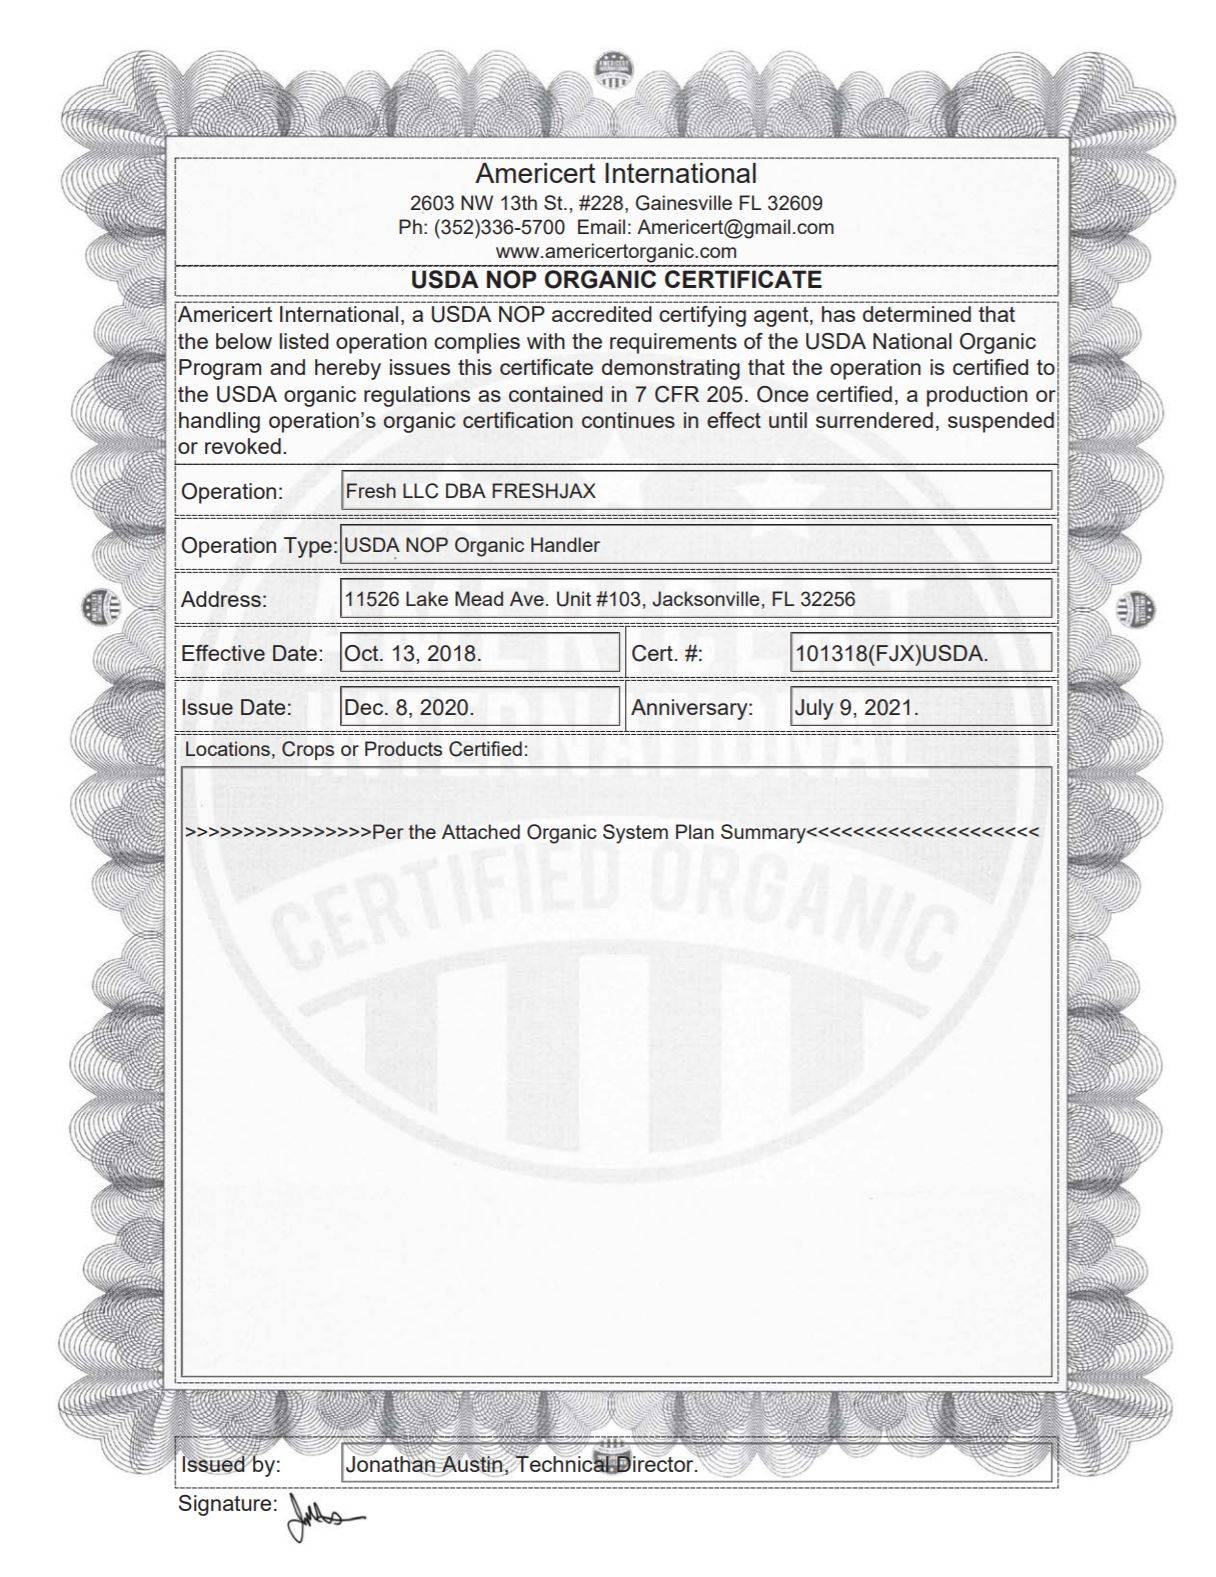 USDA NOP Organic Certificate